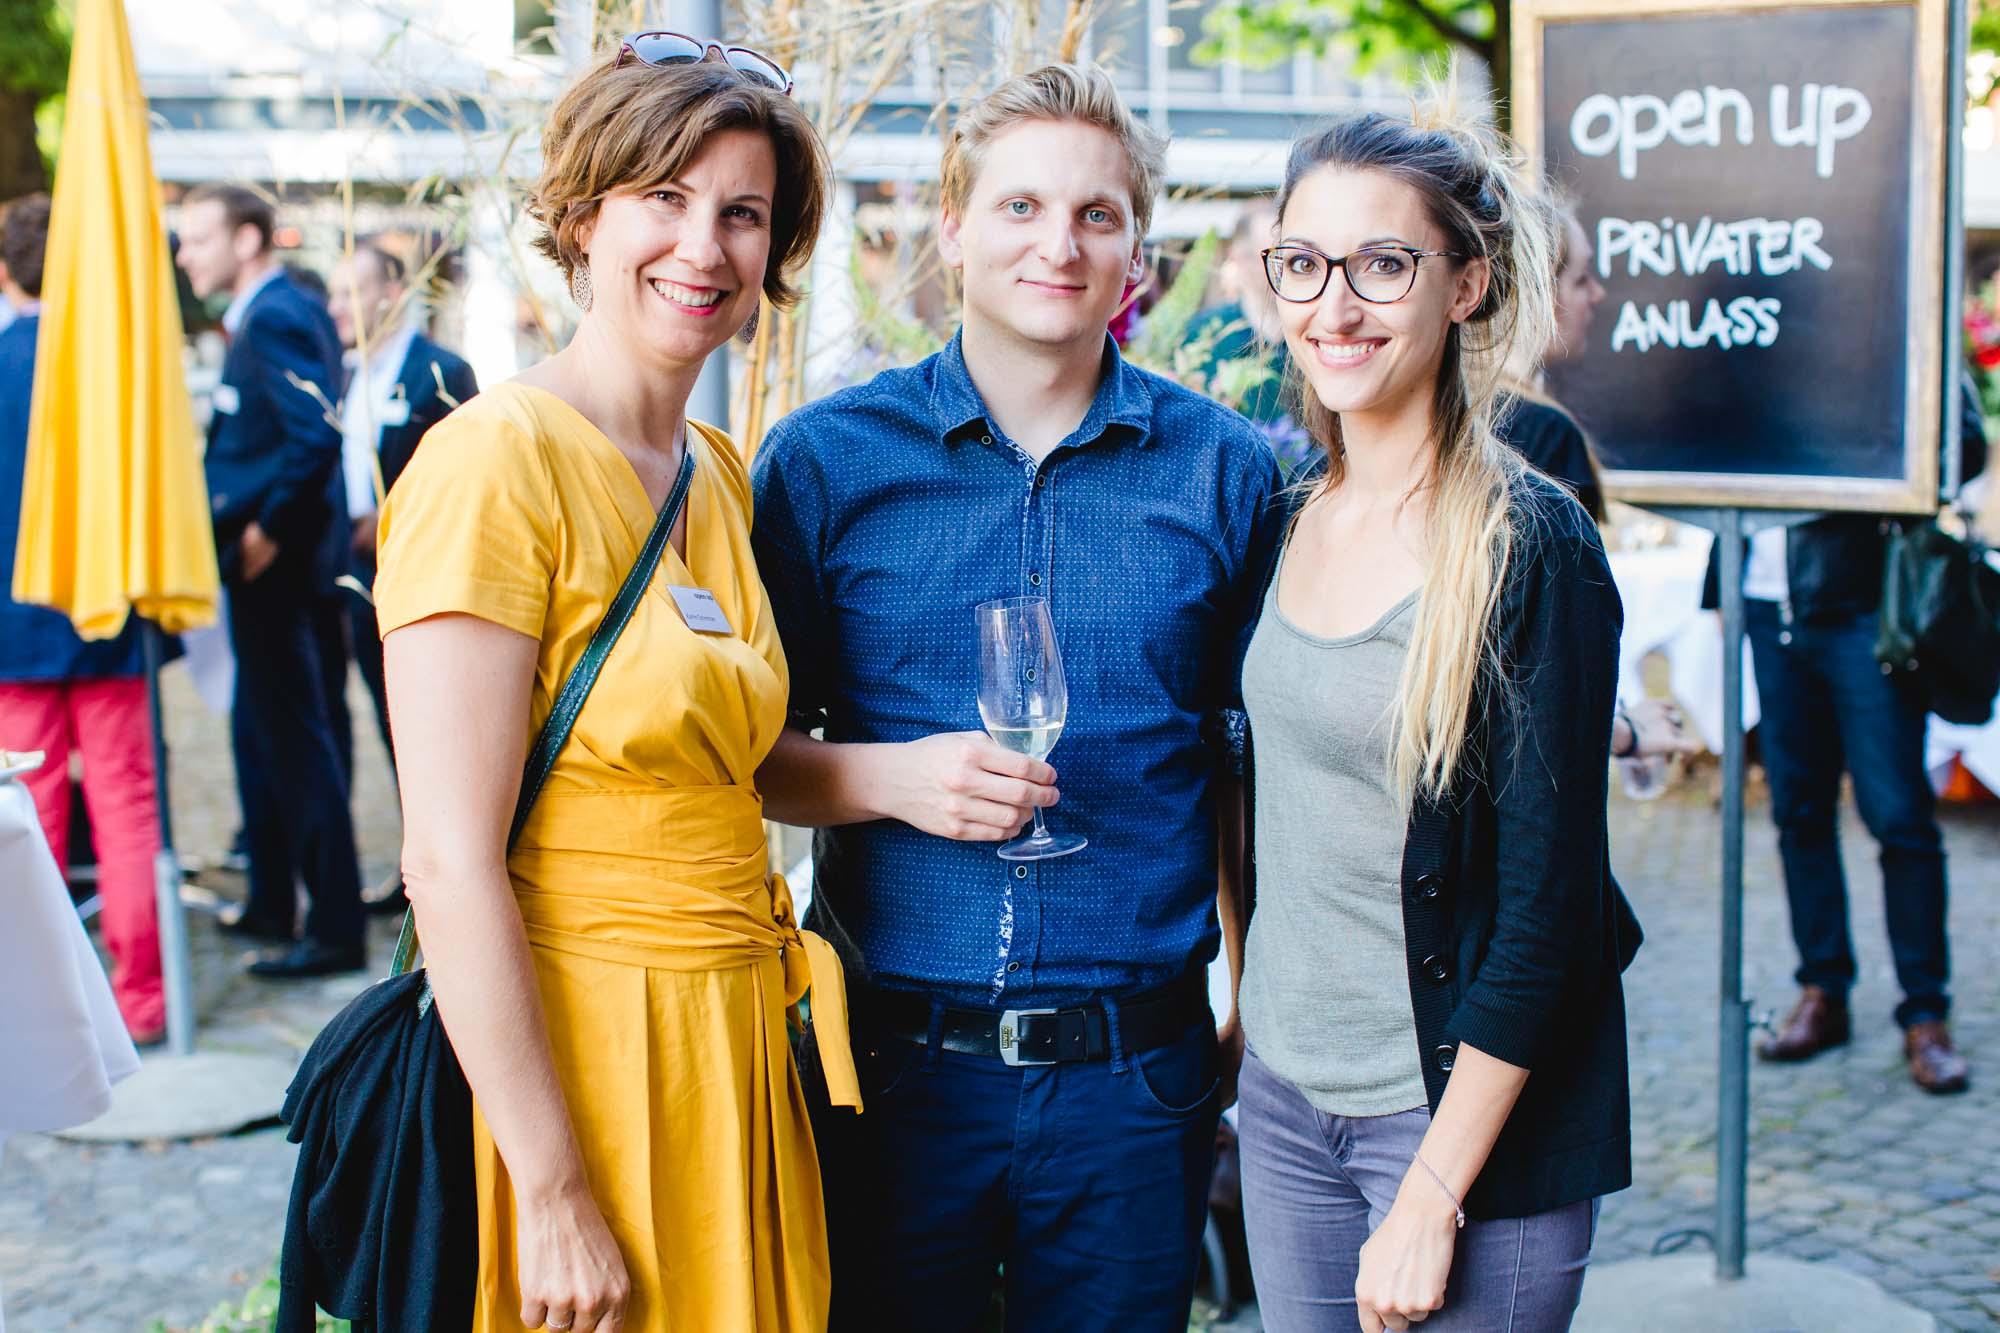 Katrin Schmitter, Ralph Büchi and Rebecca Saltalamacchia